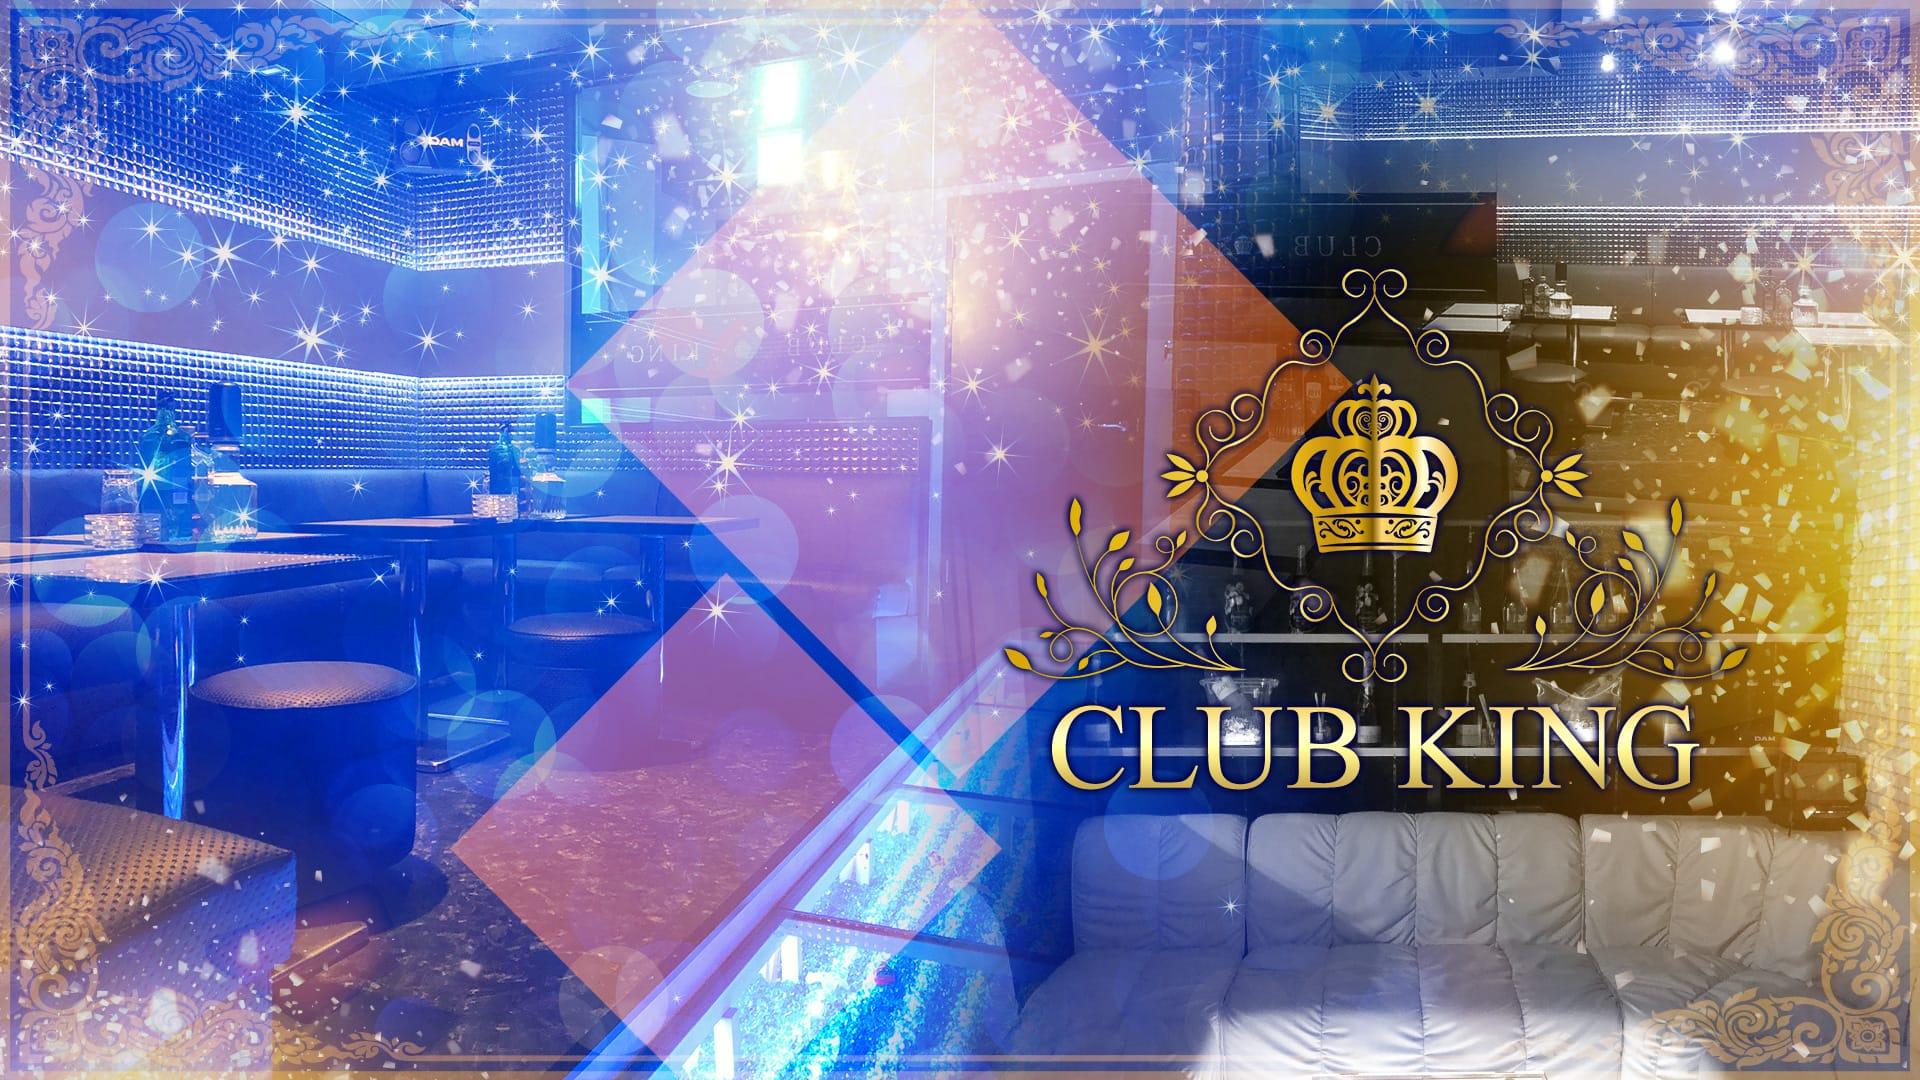 CLUB KING (キング) 千葉キャバクラ TOP画像